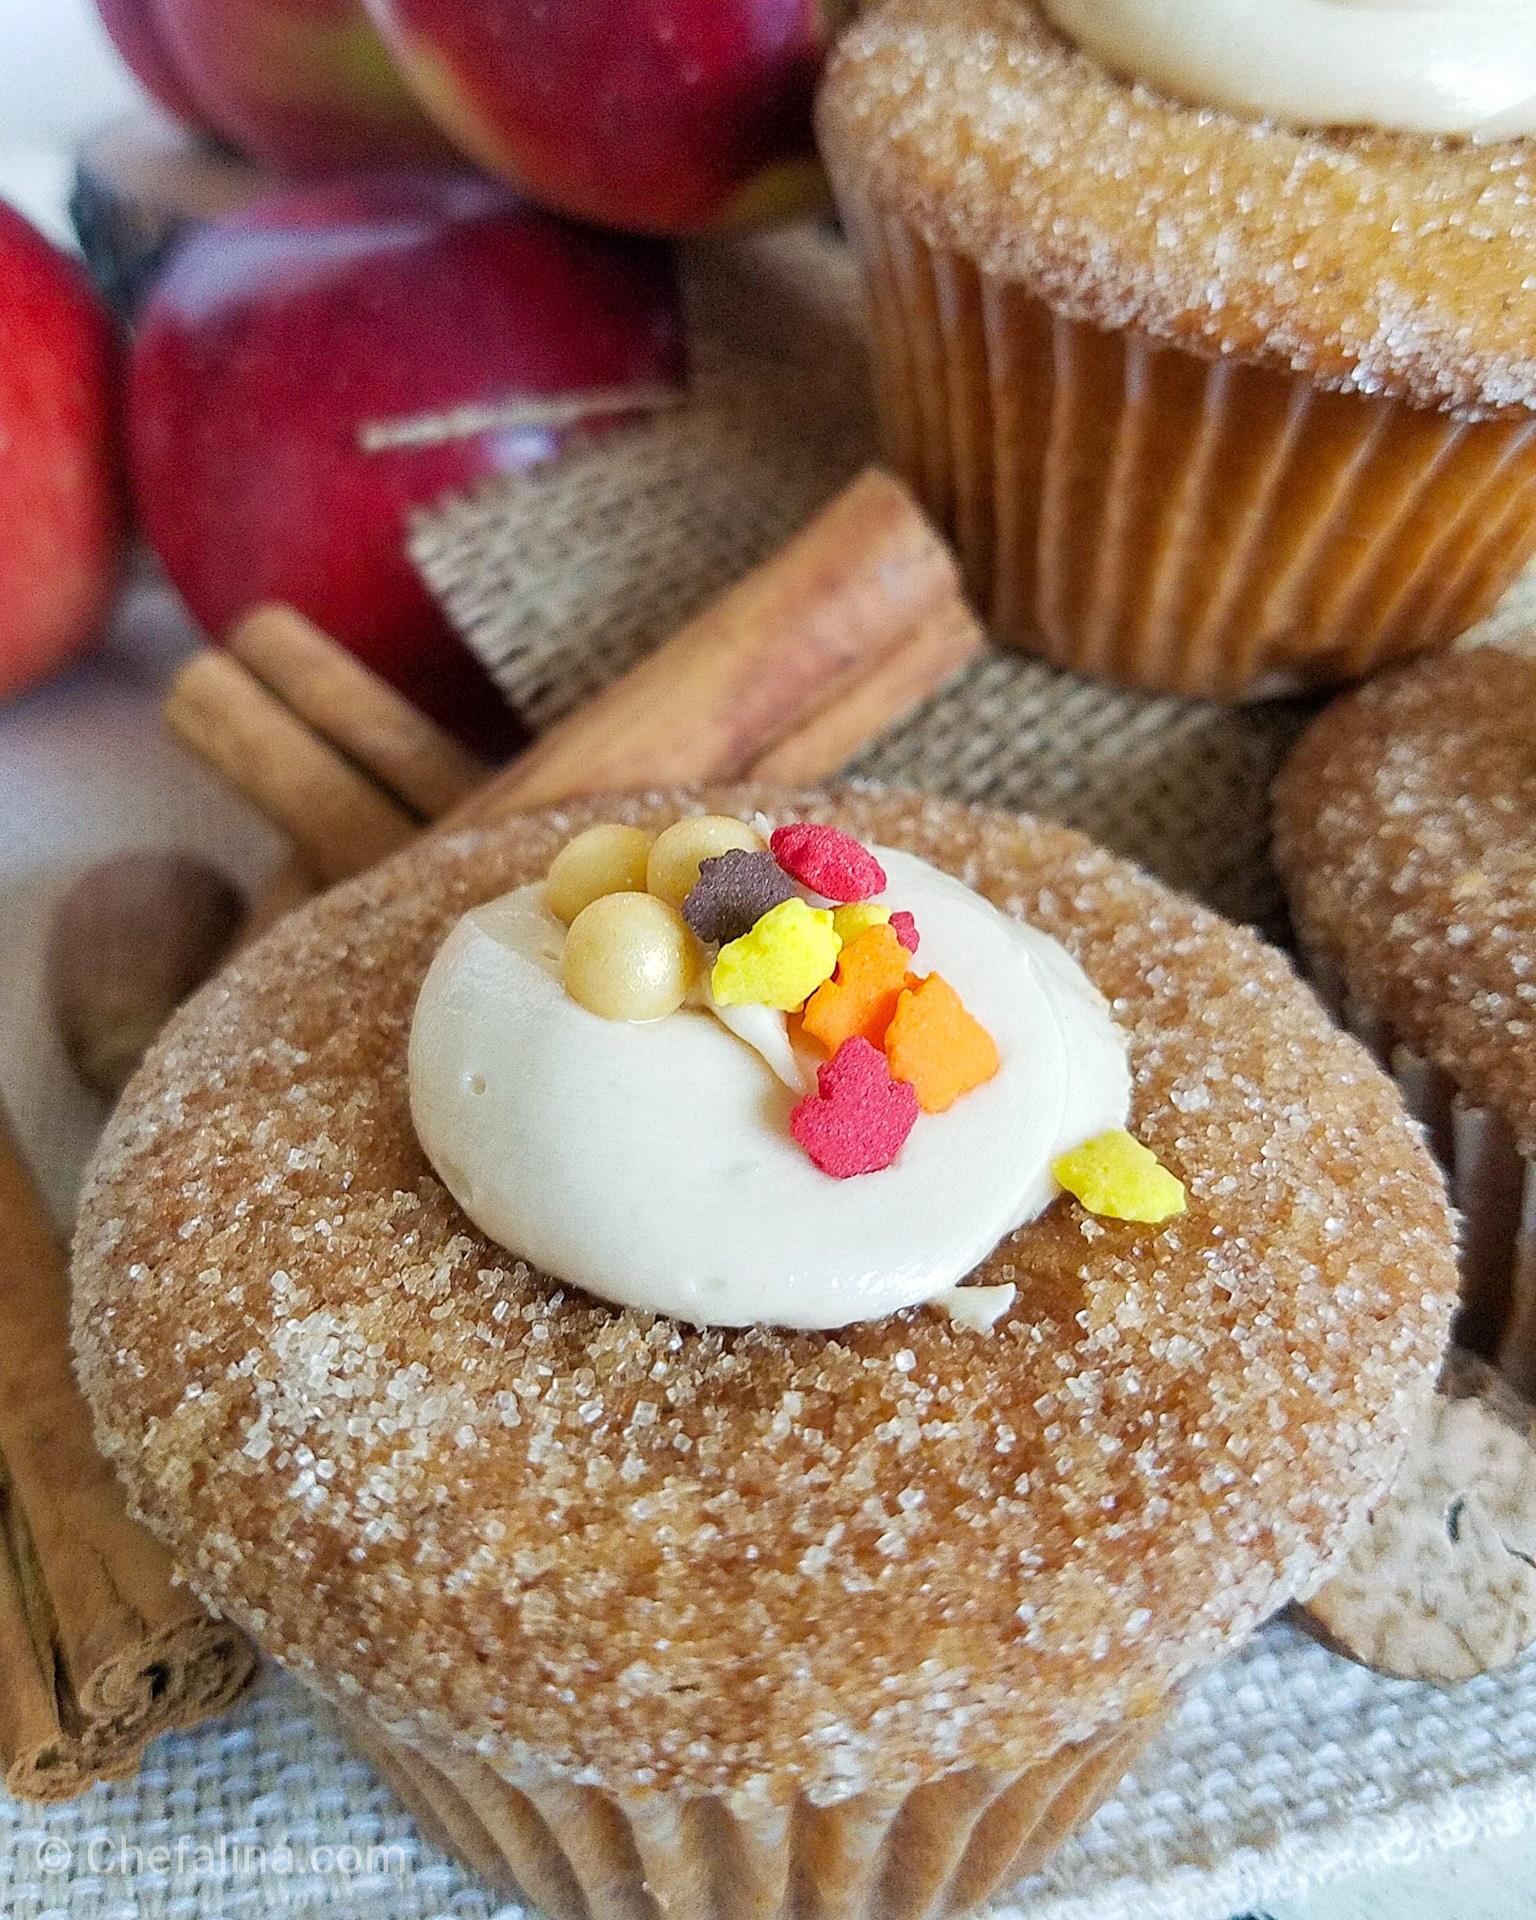 Apple Cider Donut Cupcake